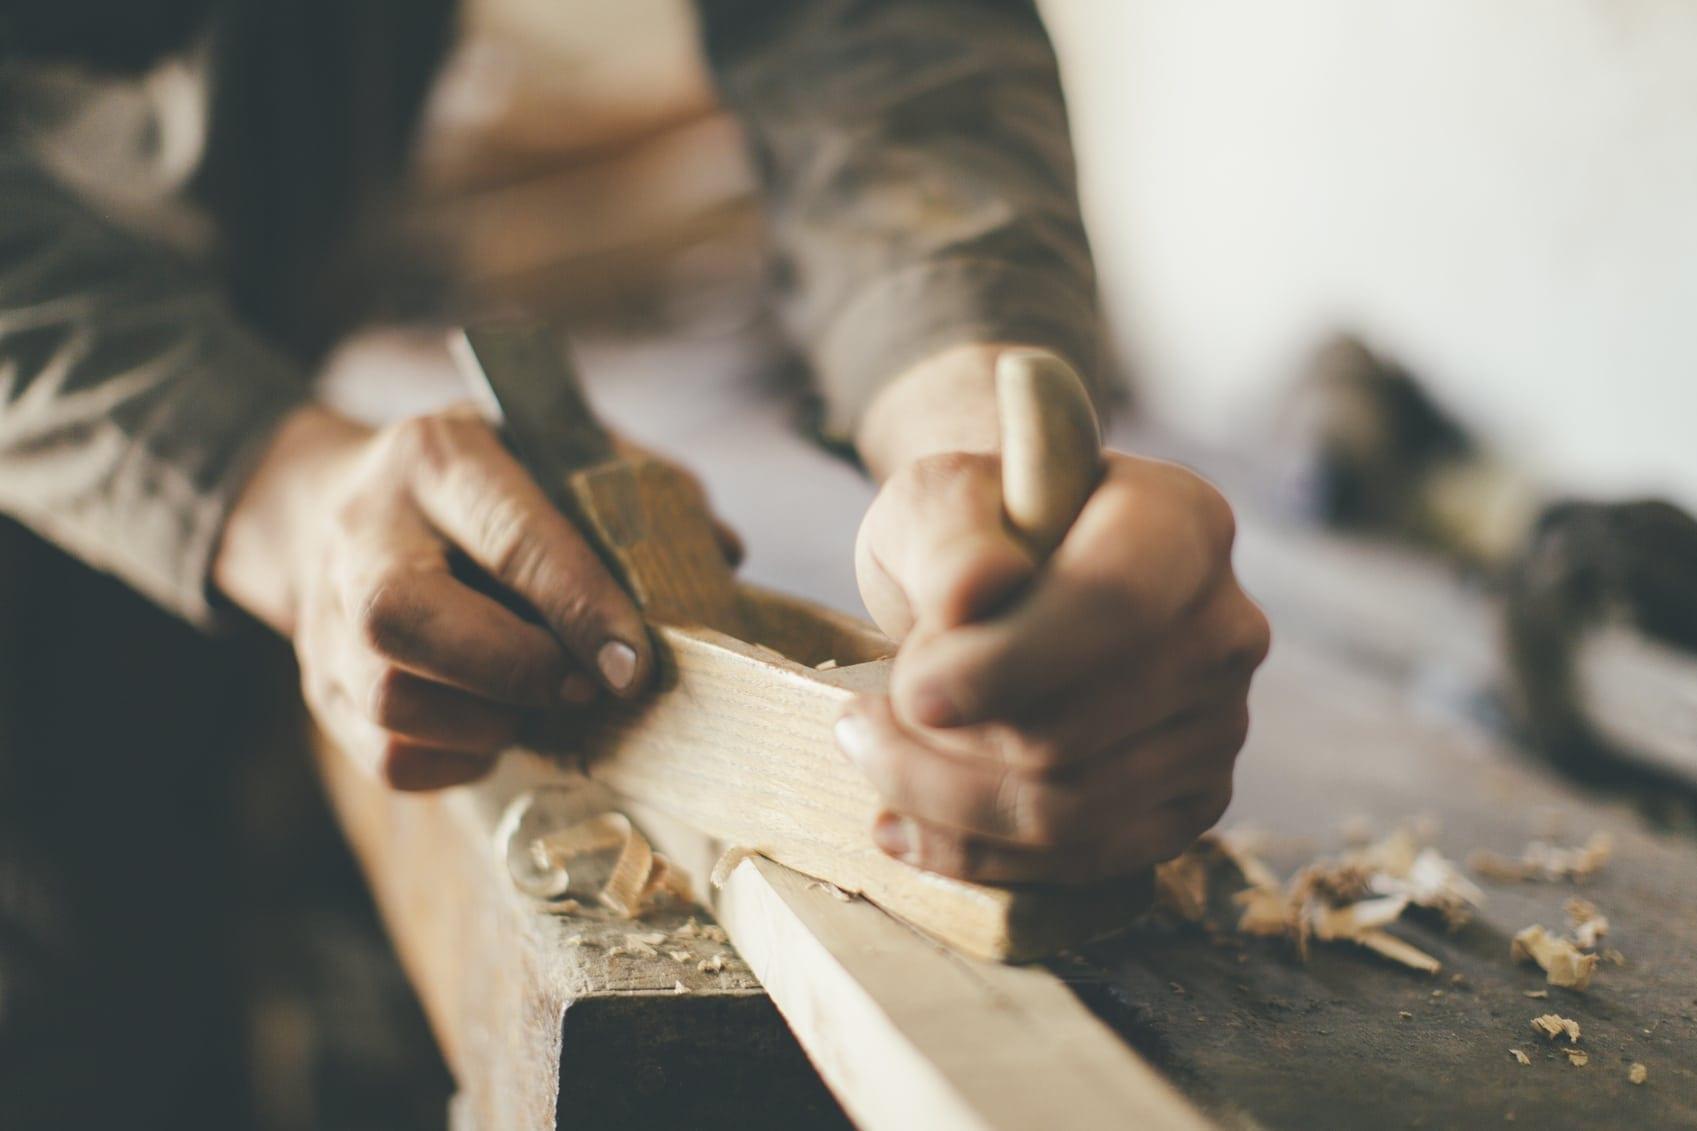 Man Cutting Wood Inside Wood Shop Stock Photo